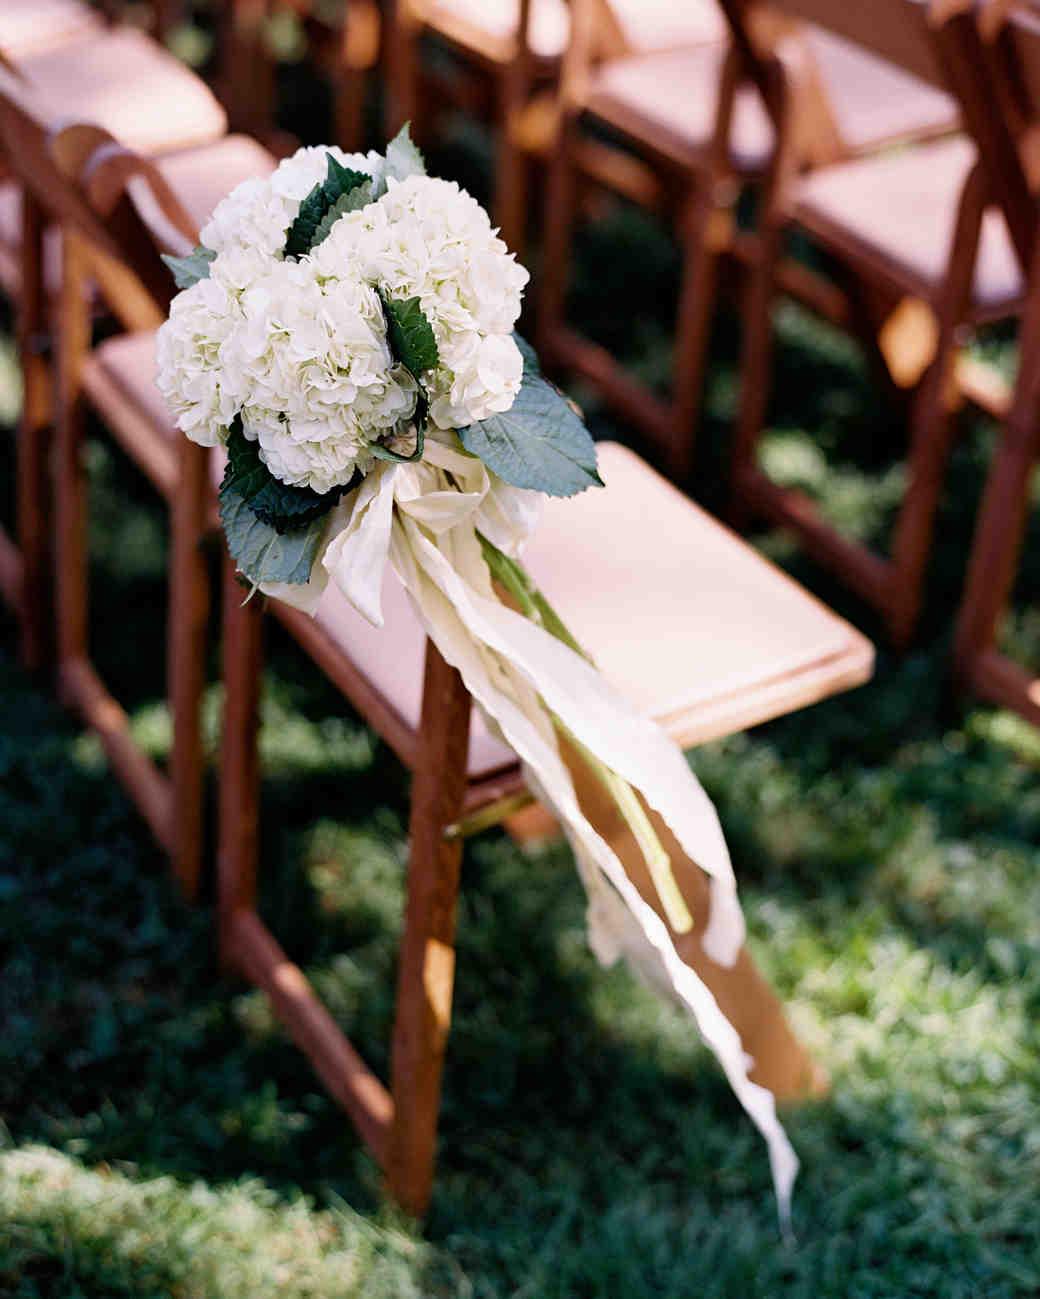 beth-scott-wedding-aisle-0530-s112077-0715.jpg